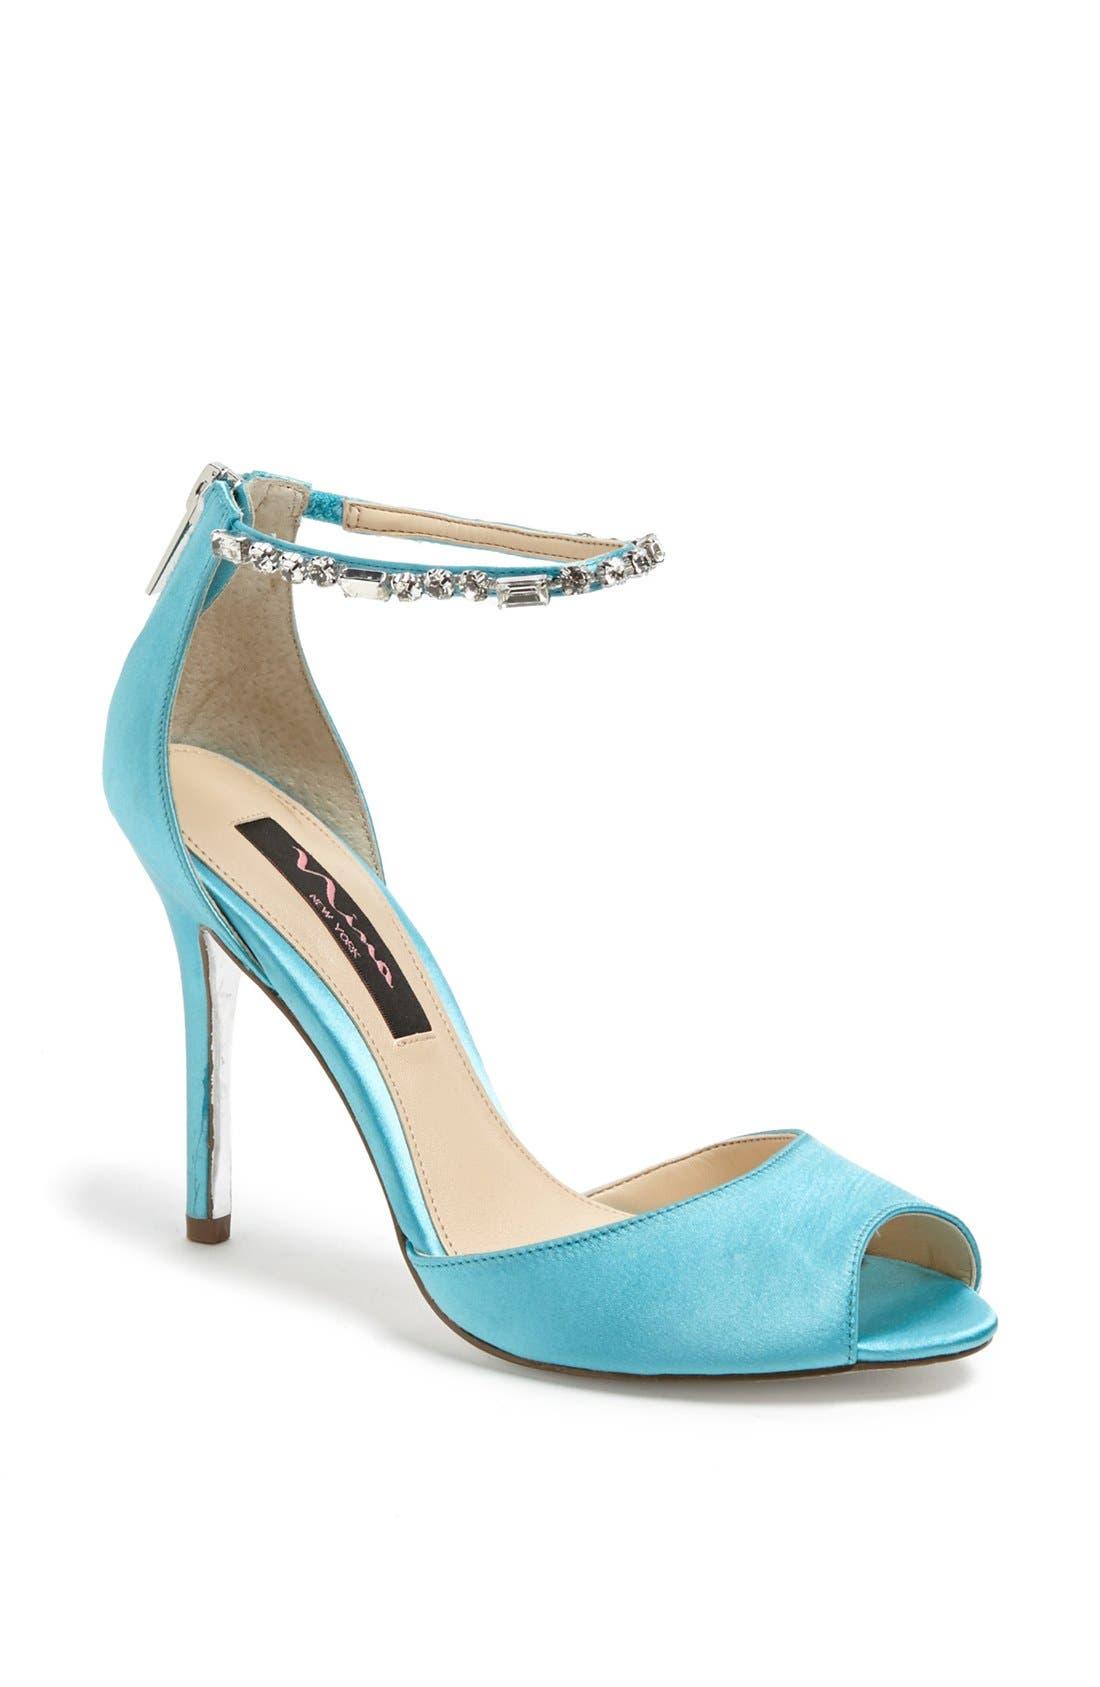 Alternate Image 1 Selected - Nina 'Maraya' Sandal (Online Only)